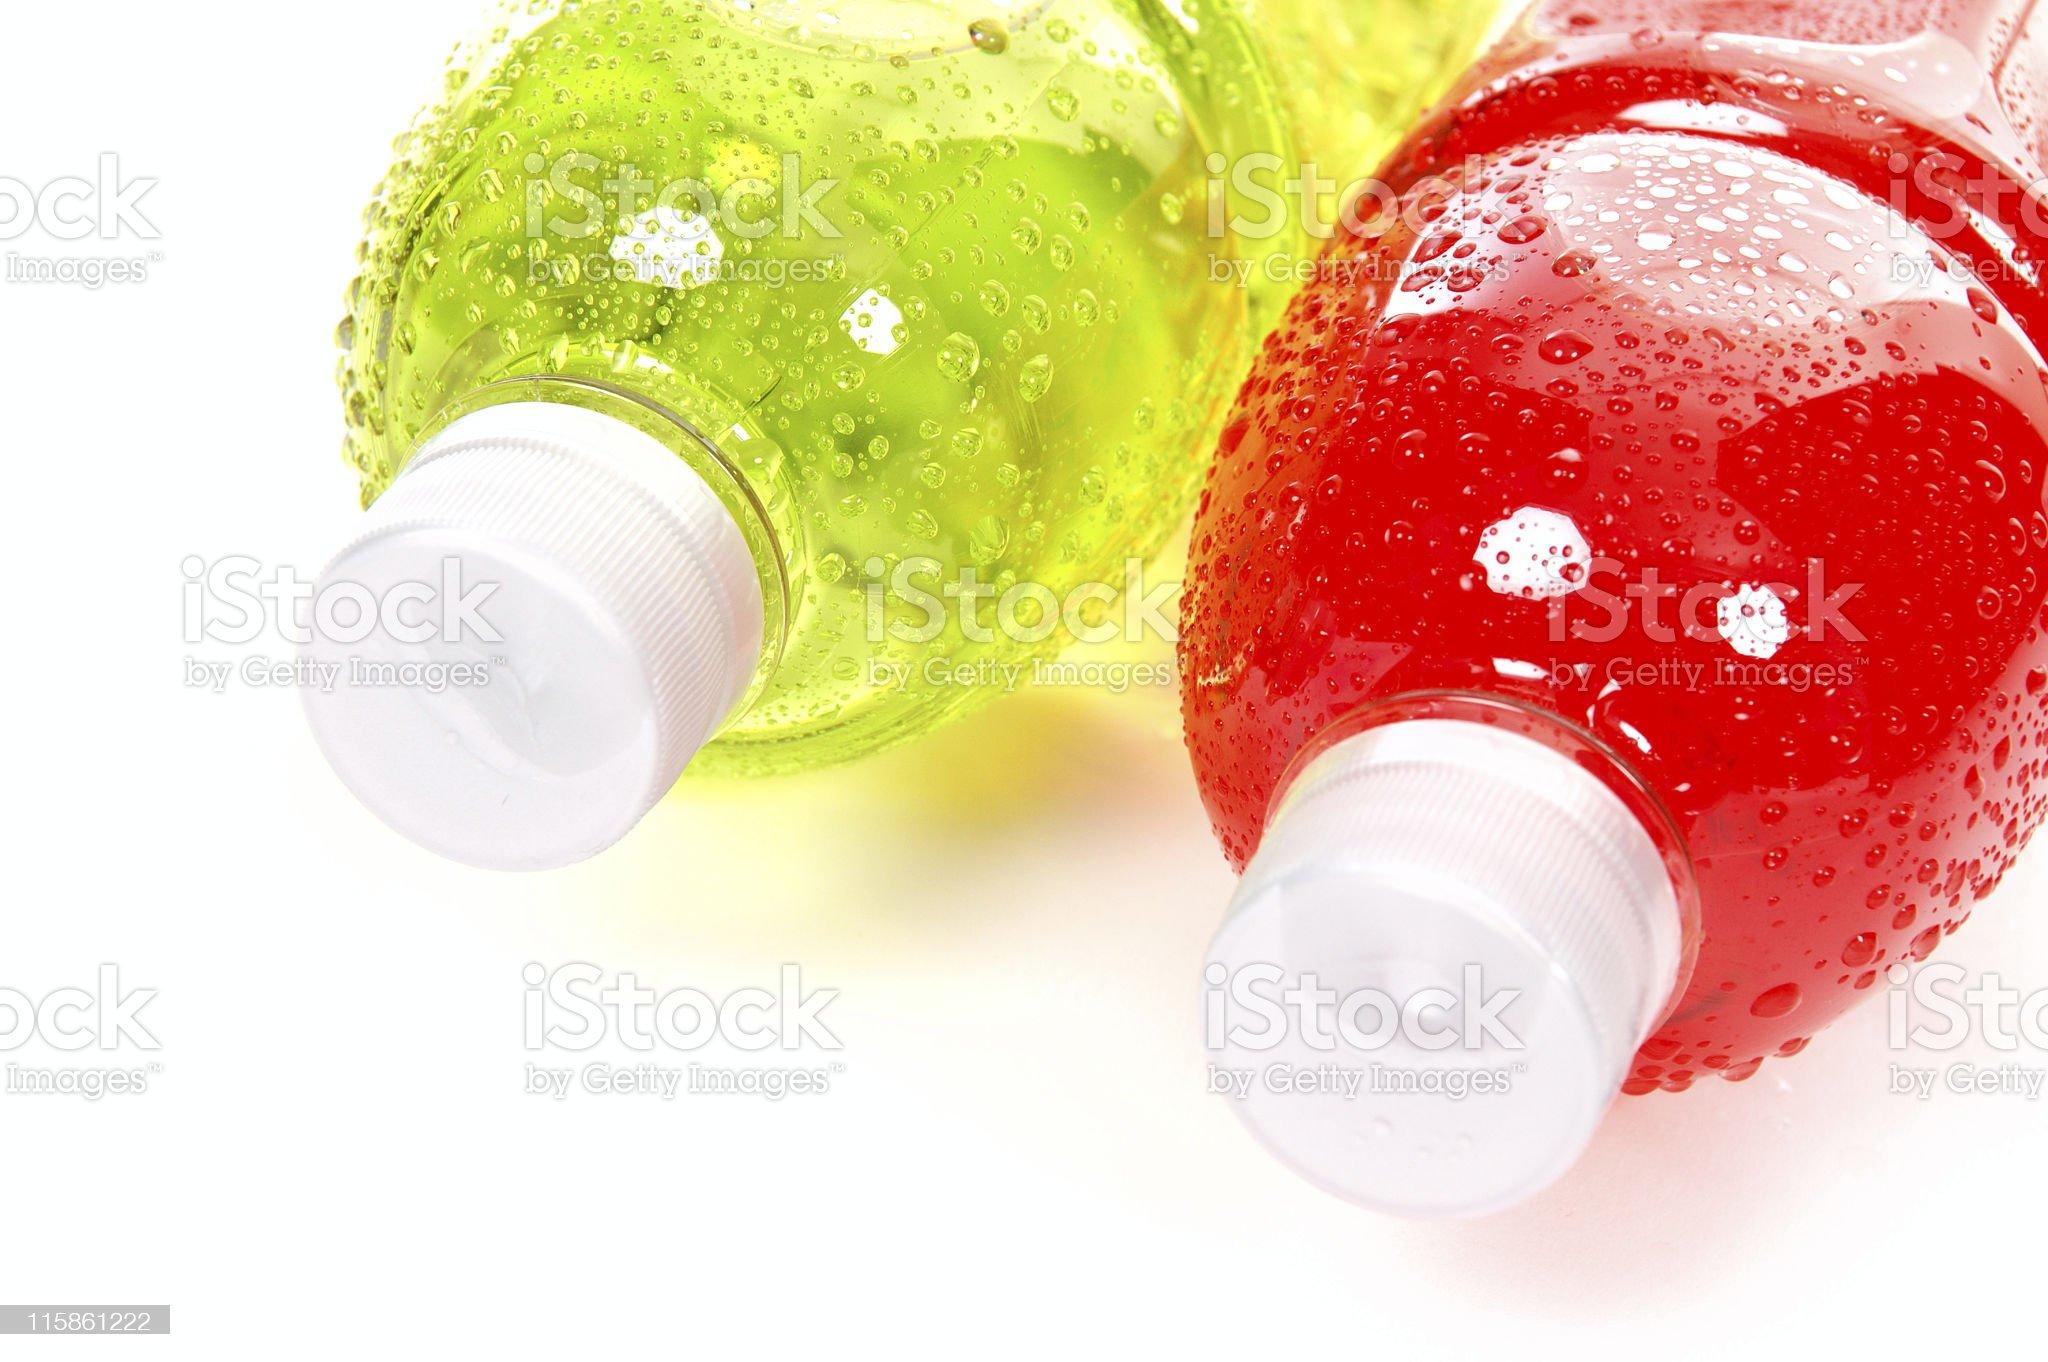 Fresh energy drink royalty-free stock photo